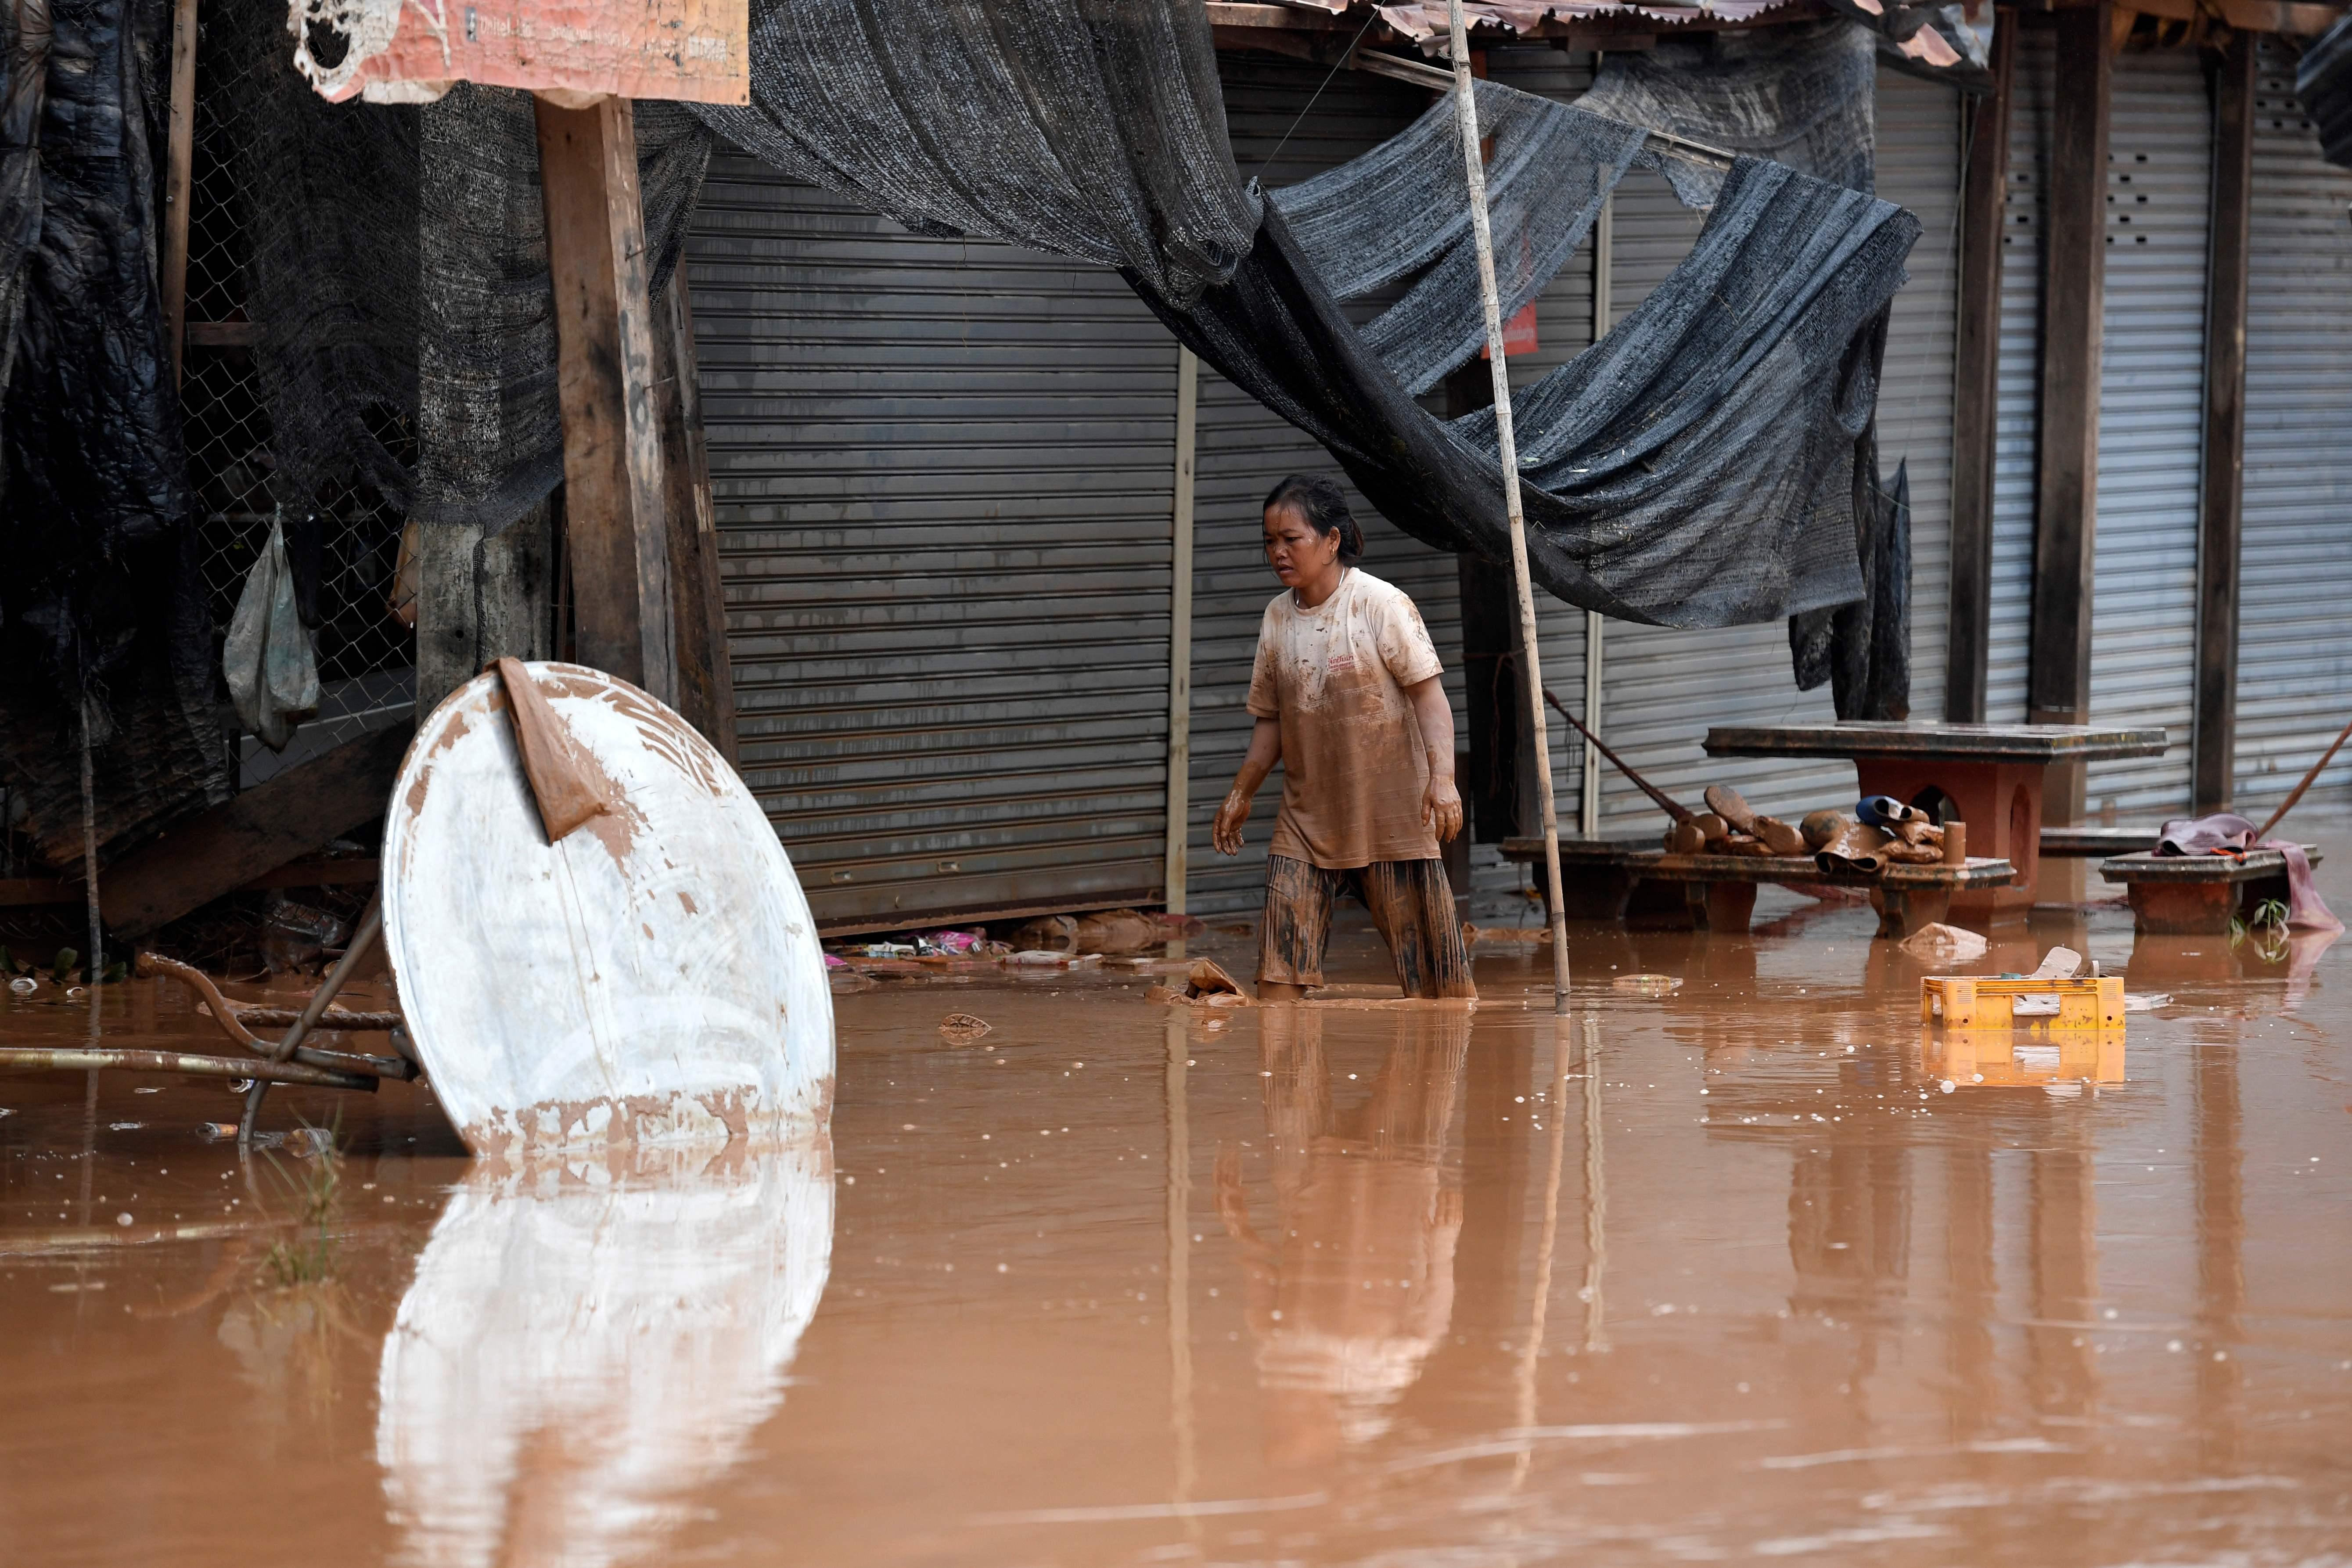 مياه الفيضانات